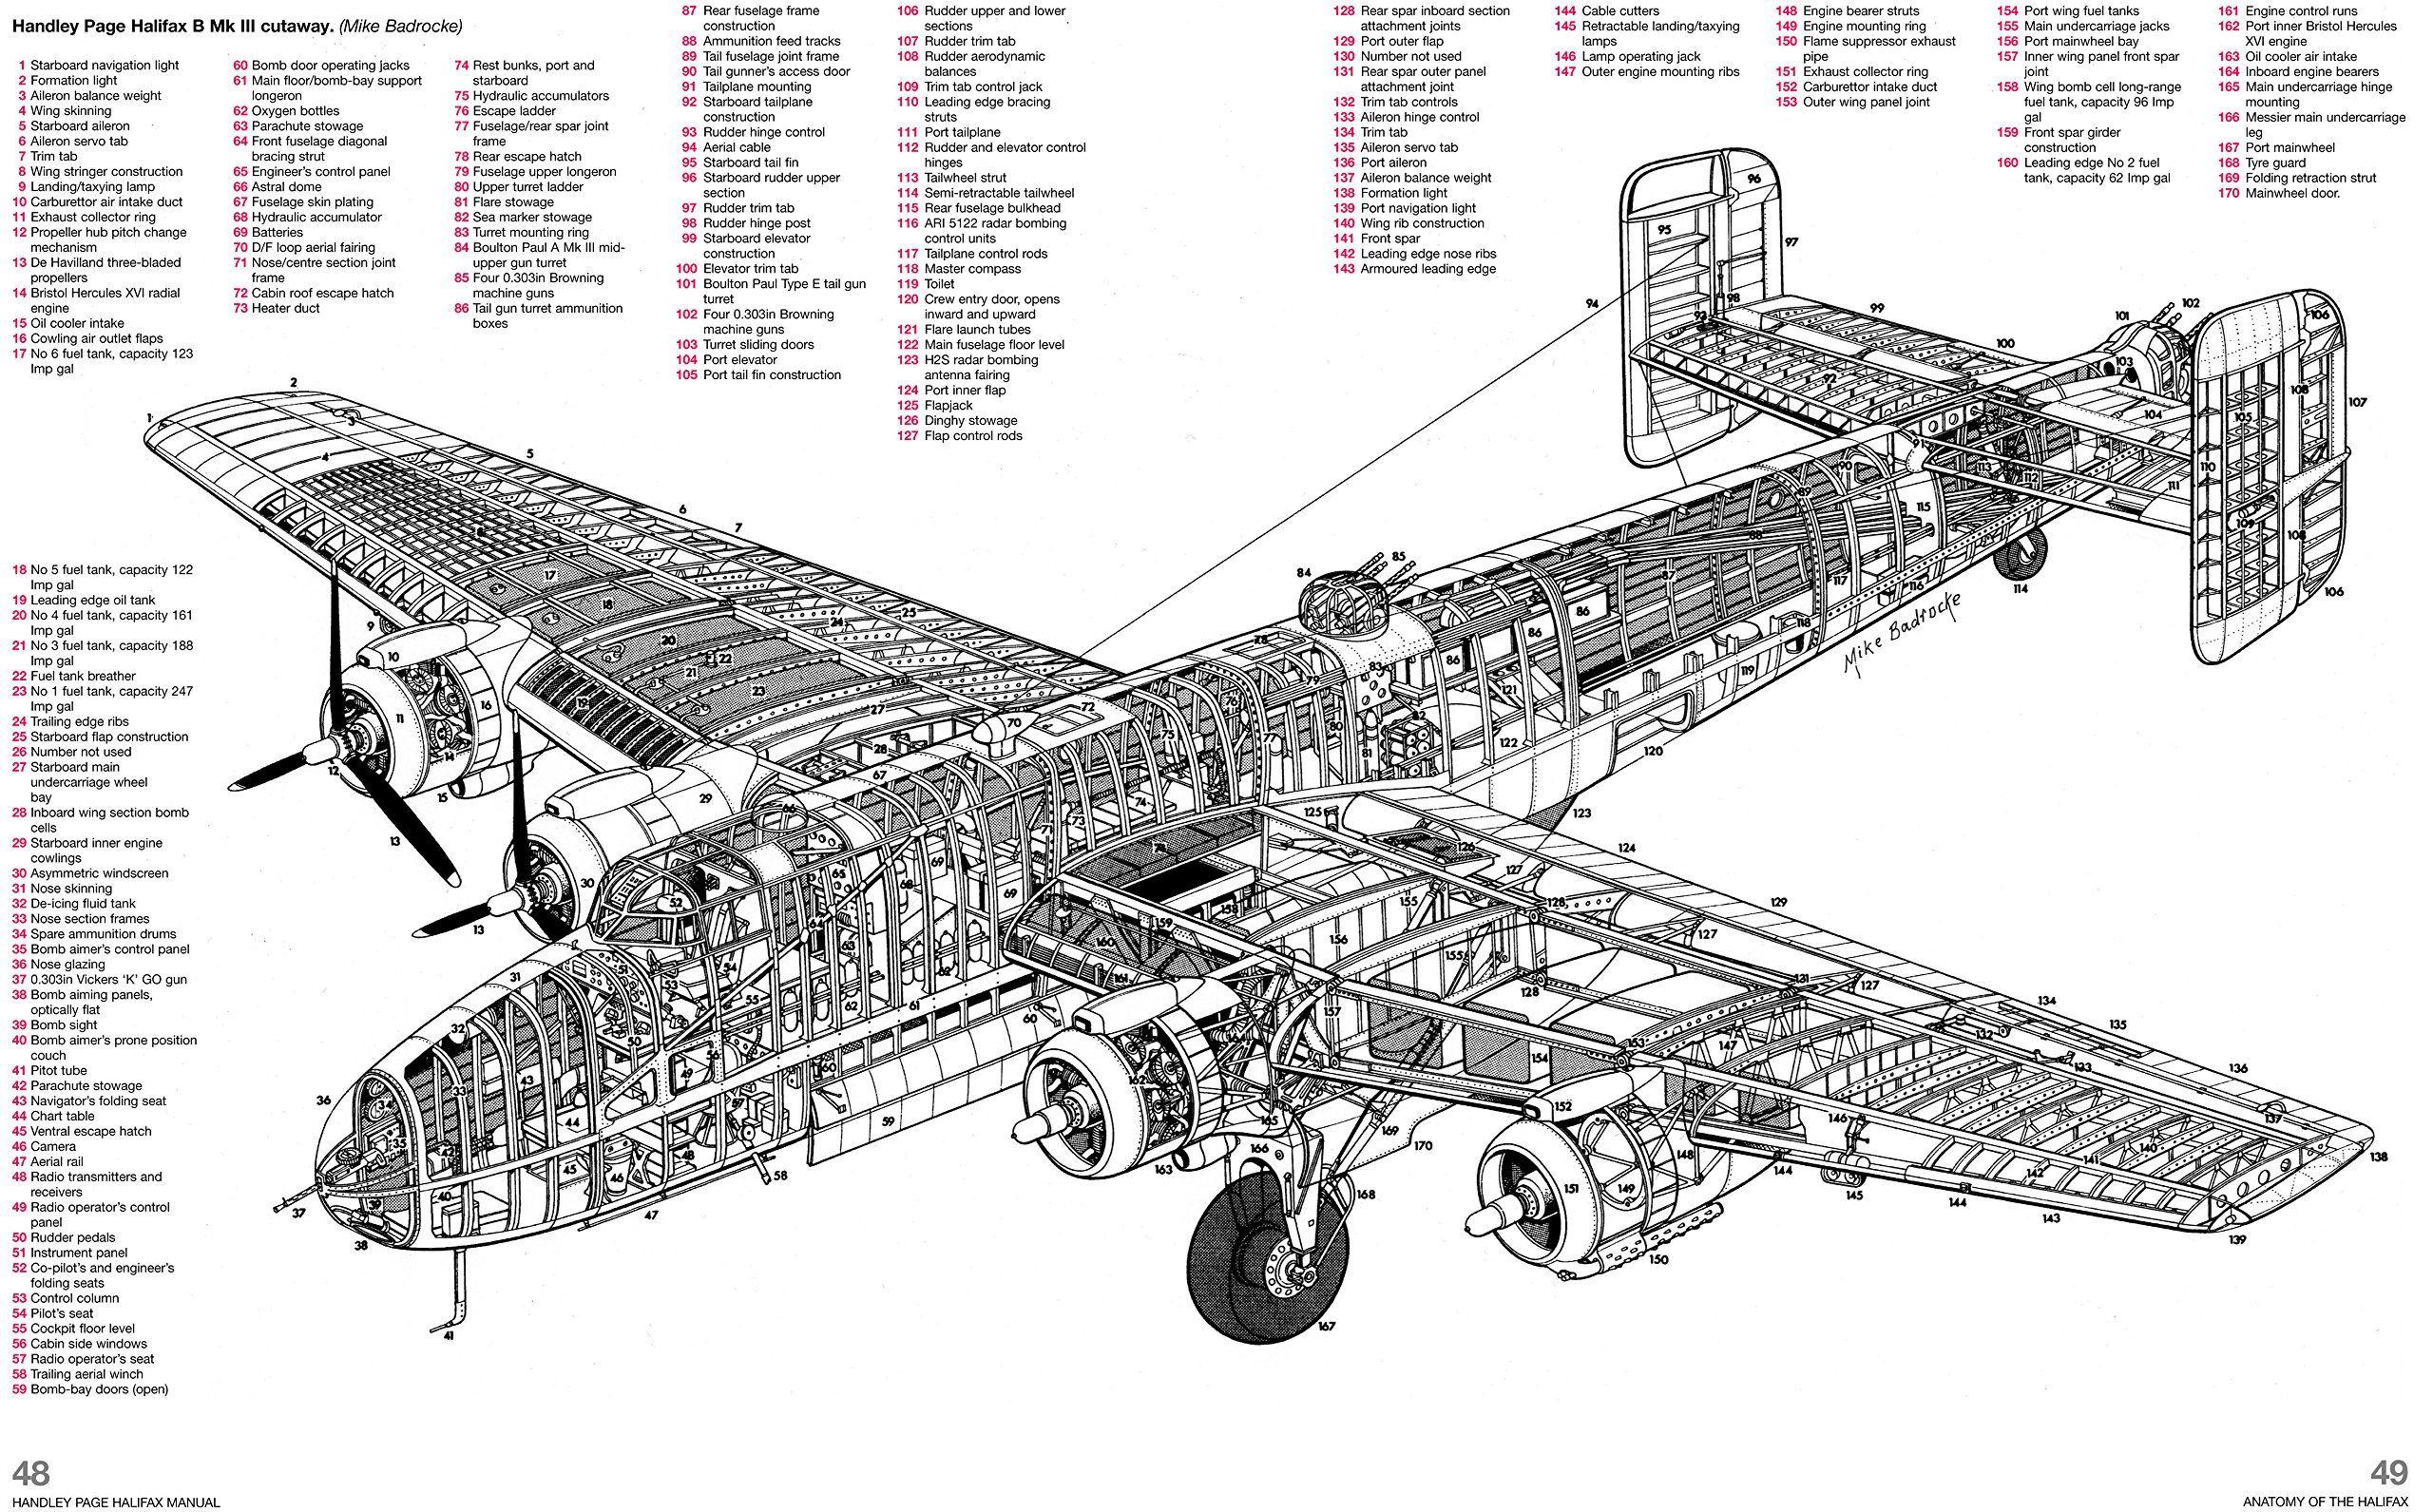 avies militares horten ho 229 diagramas 3d t